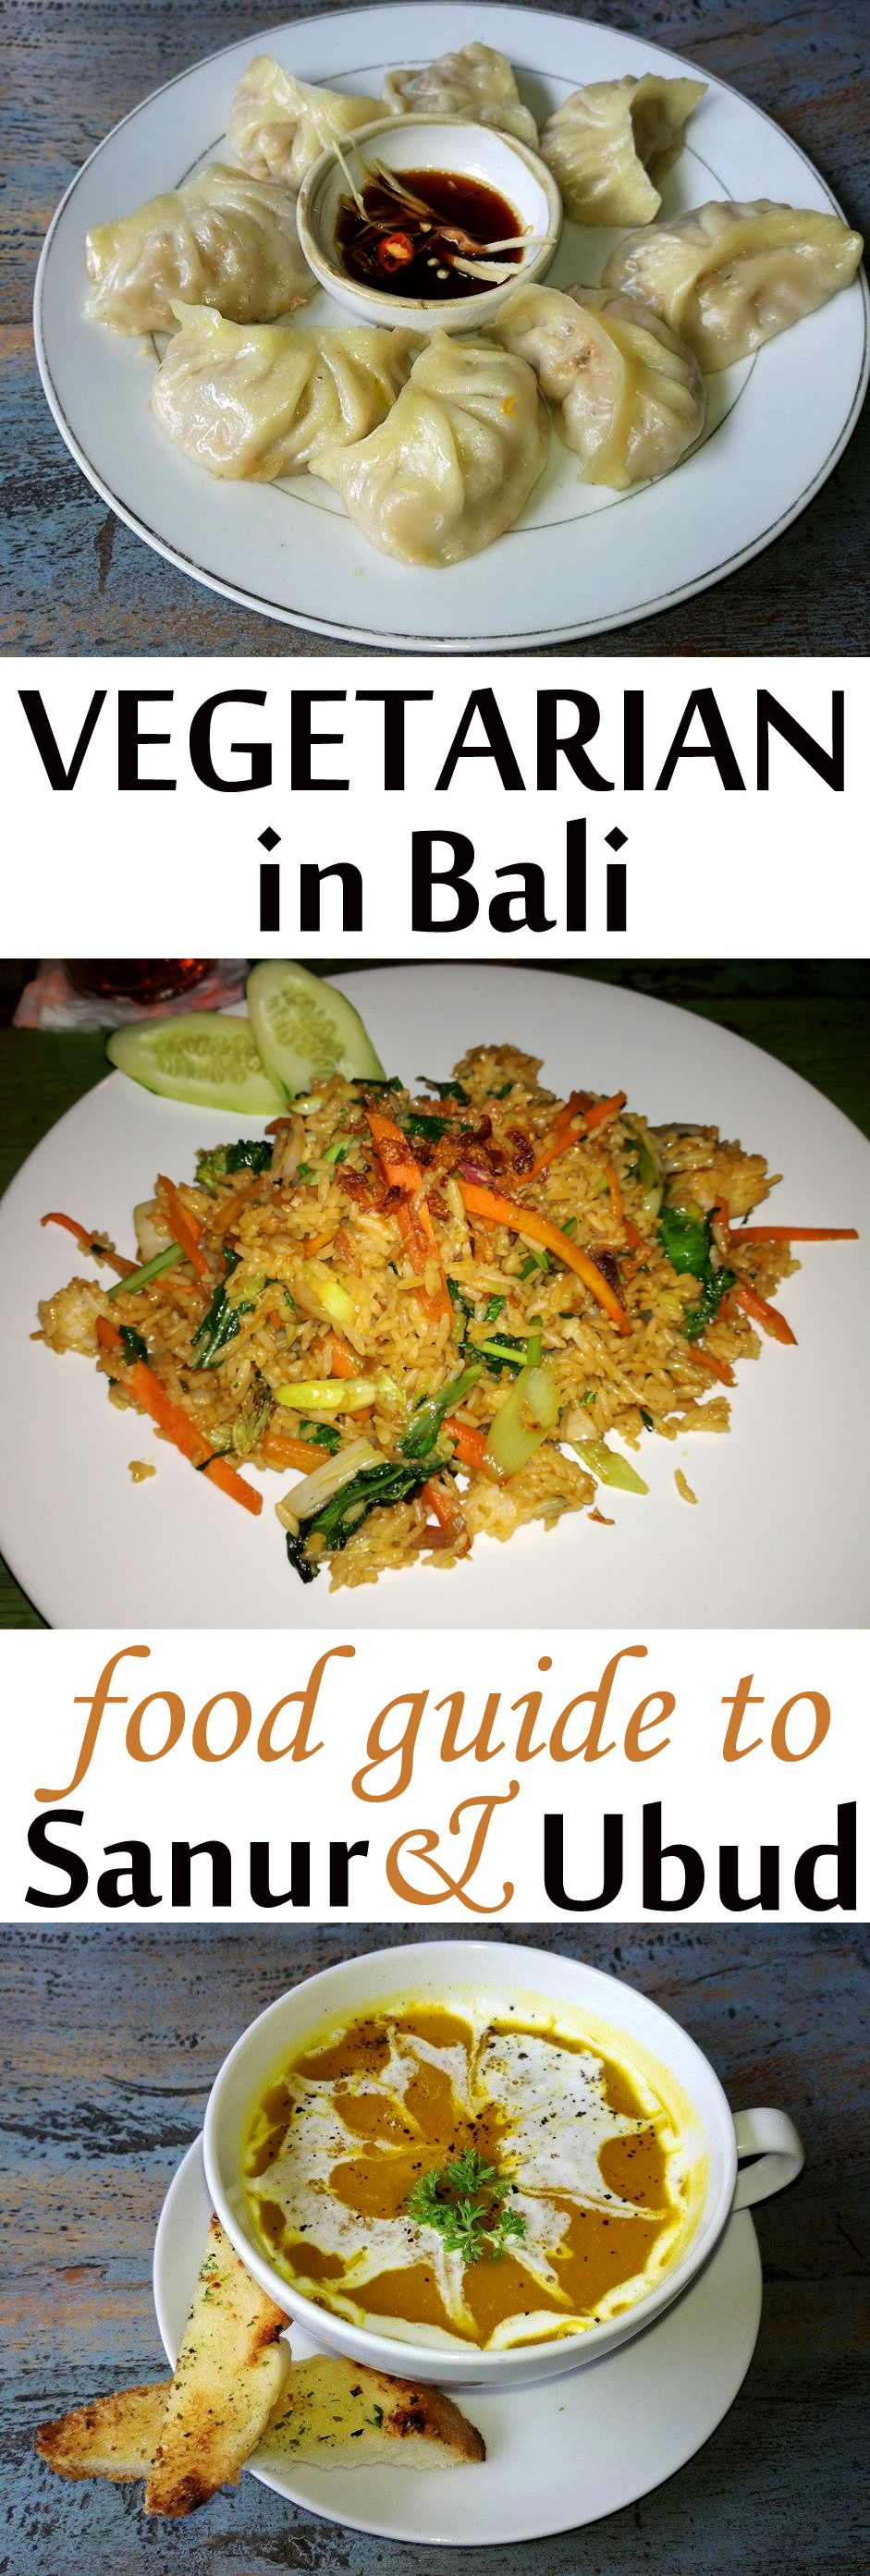 Food Guide To Vegetarian Sanur And Ubud Bali Vegetariantravel Restaurants Veggie Foodguide Asia Vegan Veggiefoodies